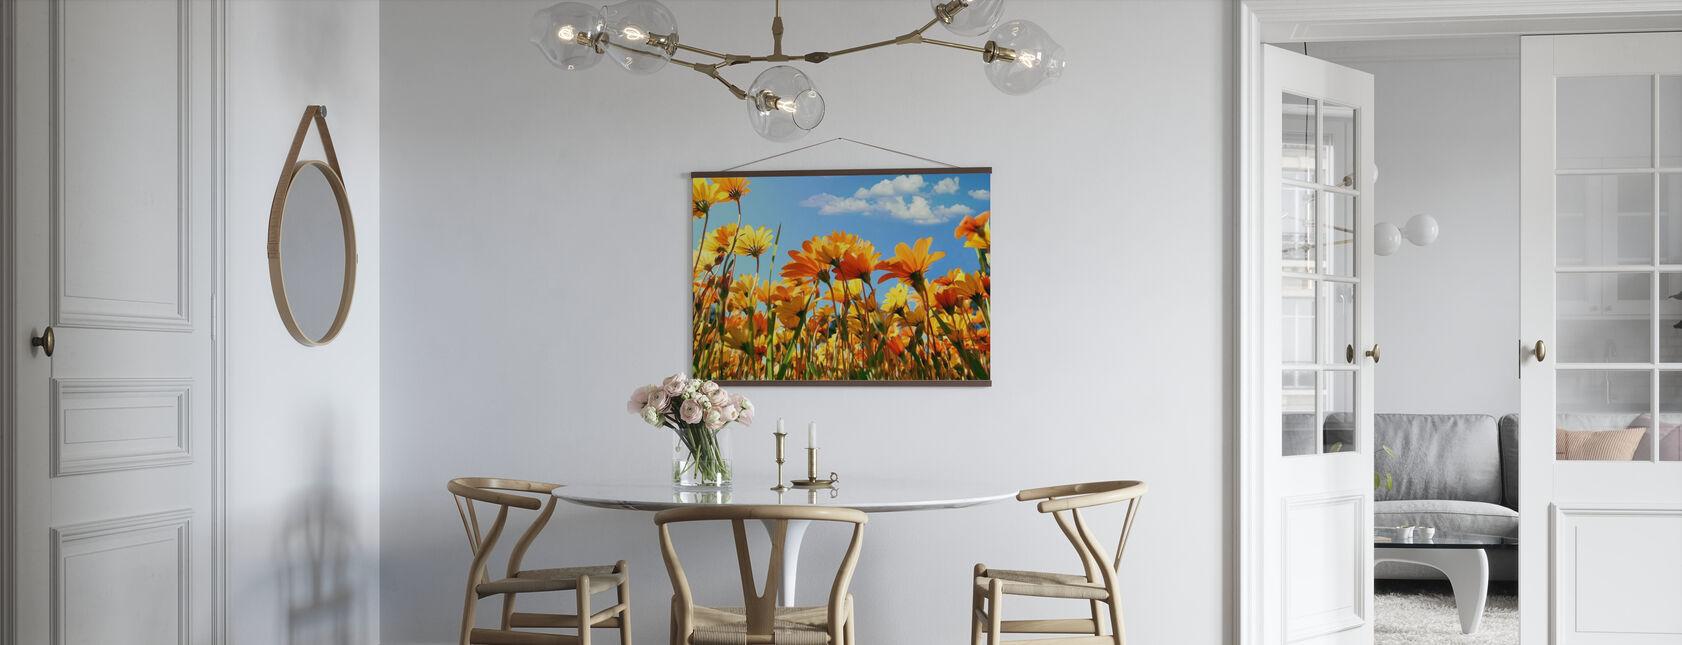 Lente oranje en gele wilde bloemen - Poster - Keuken